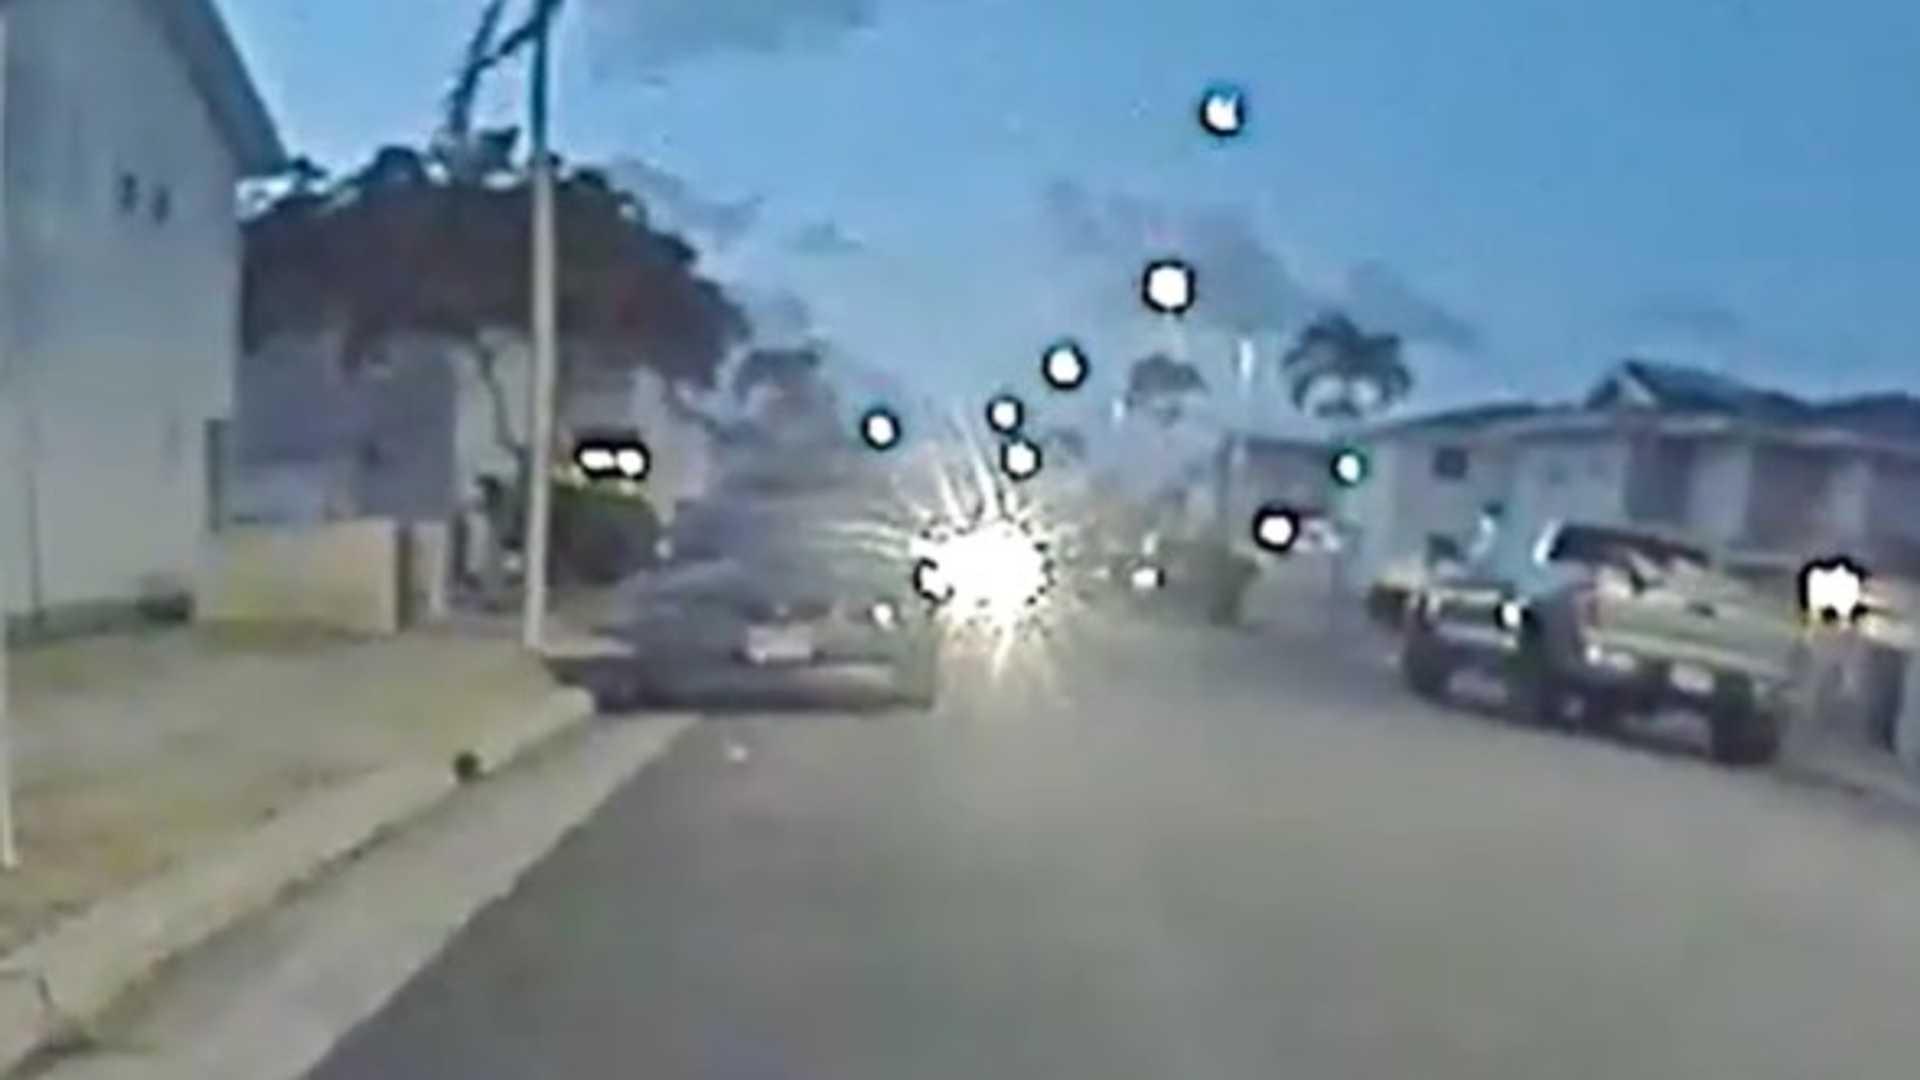 Модель 3 Tesla ловит метеор, падающий по небу на Гавайях